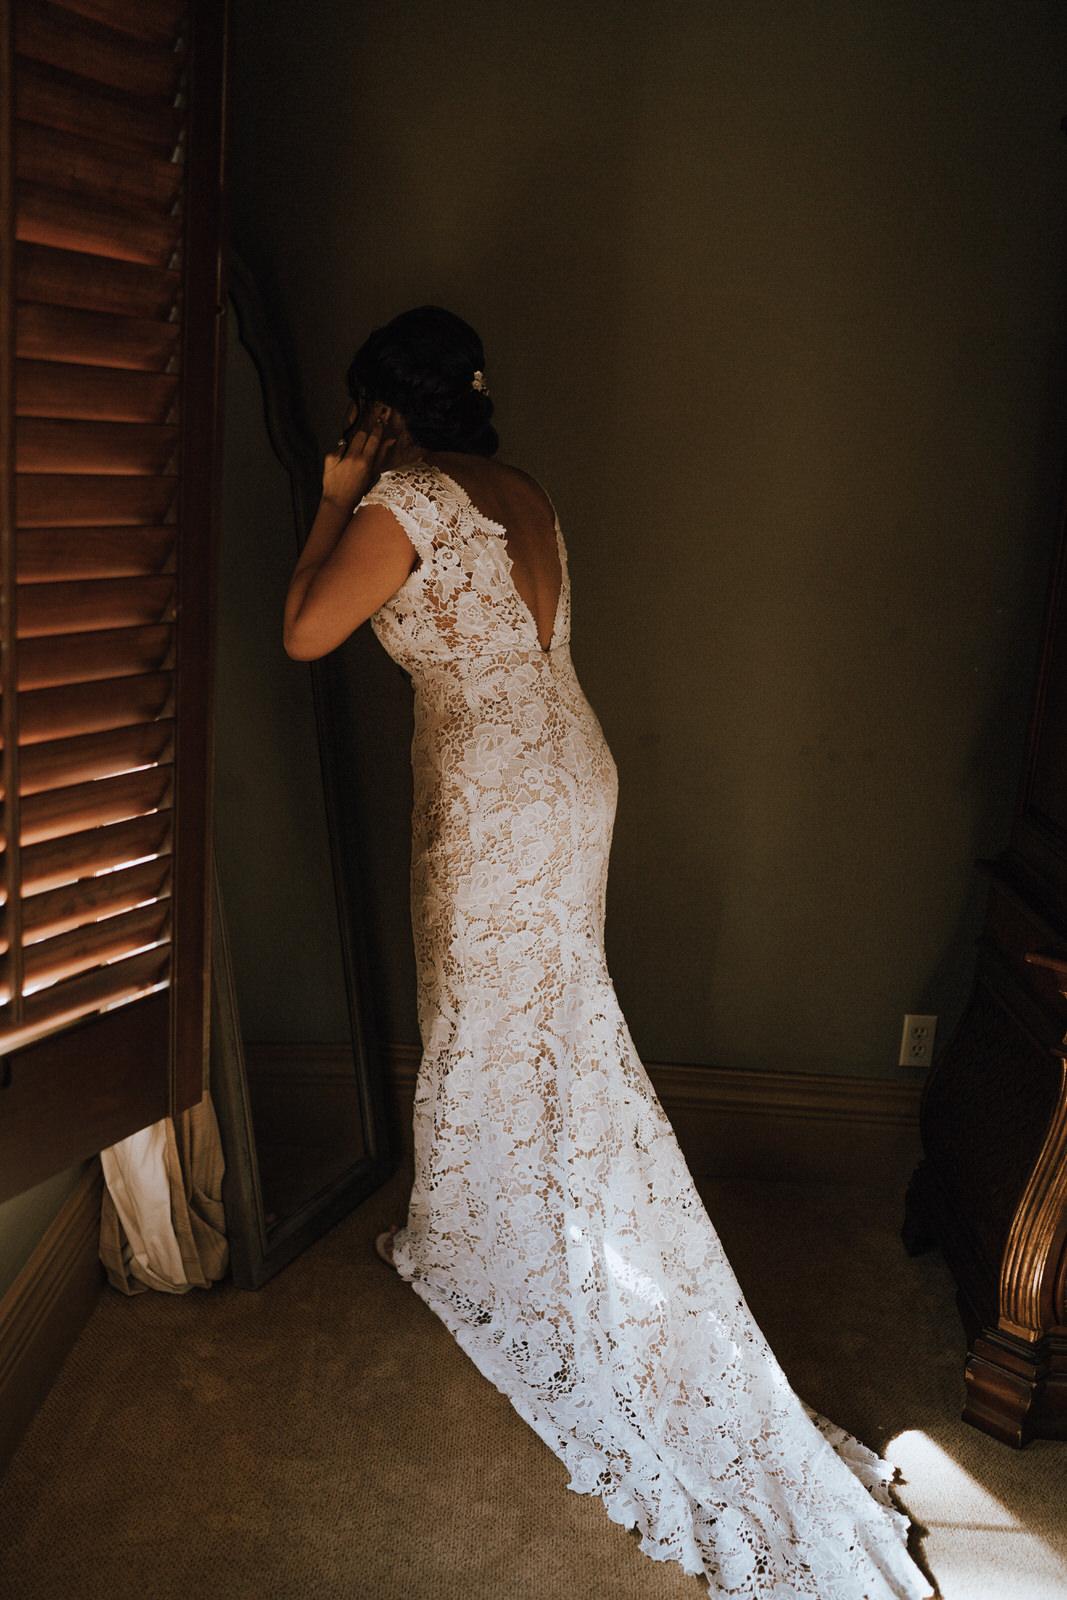 Club at the Strand Wedding- Naples Florida Wedding Photographer- Michelle Gonzalez Photography- Desiree and Bryan-229.JPG